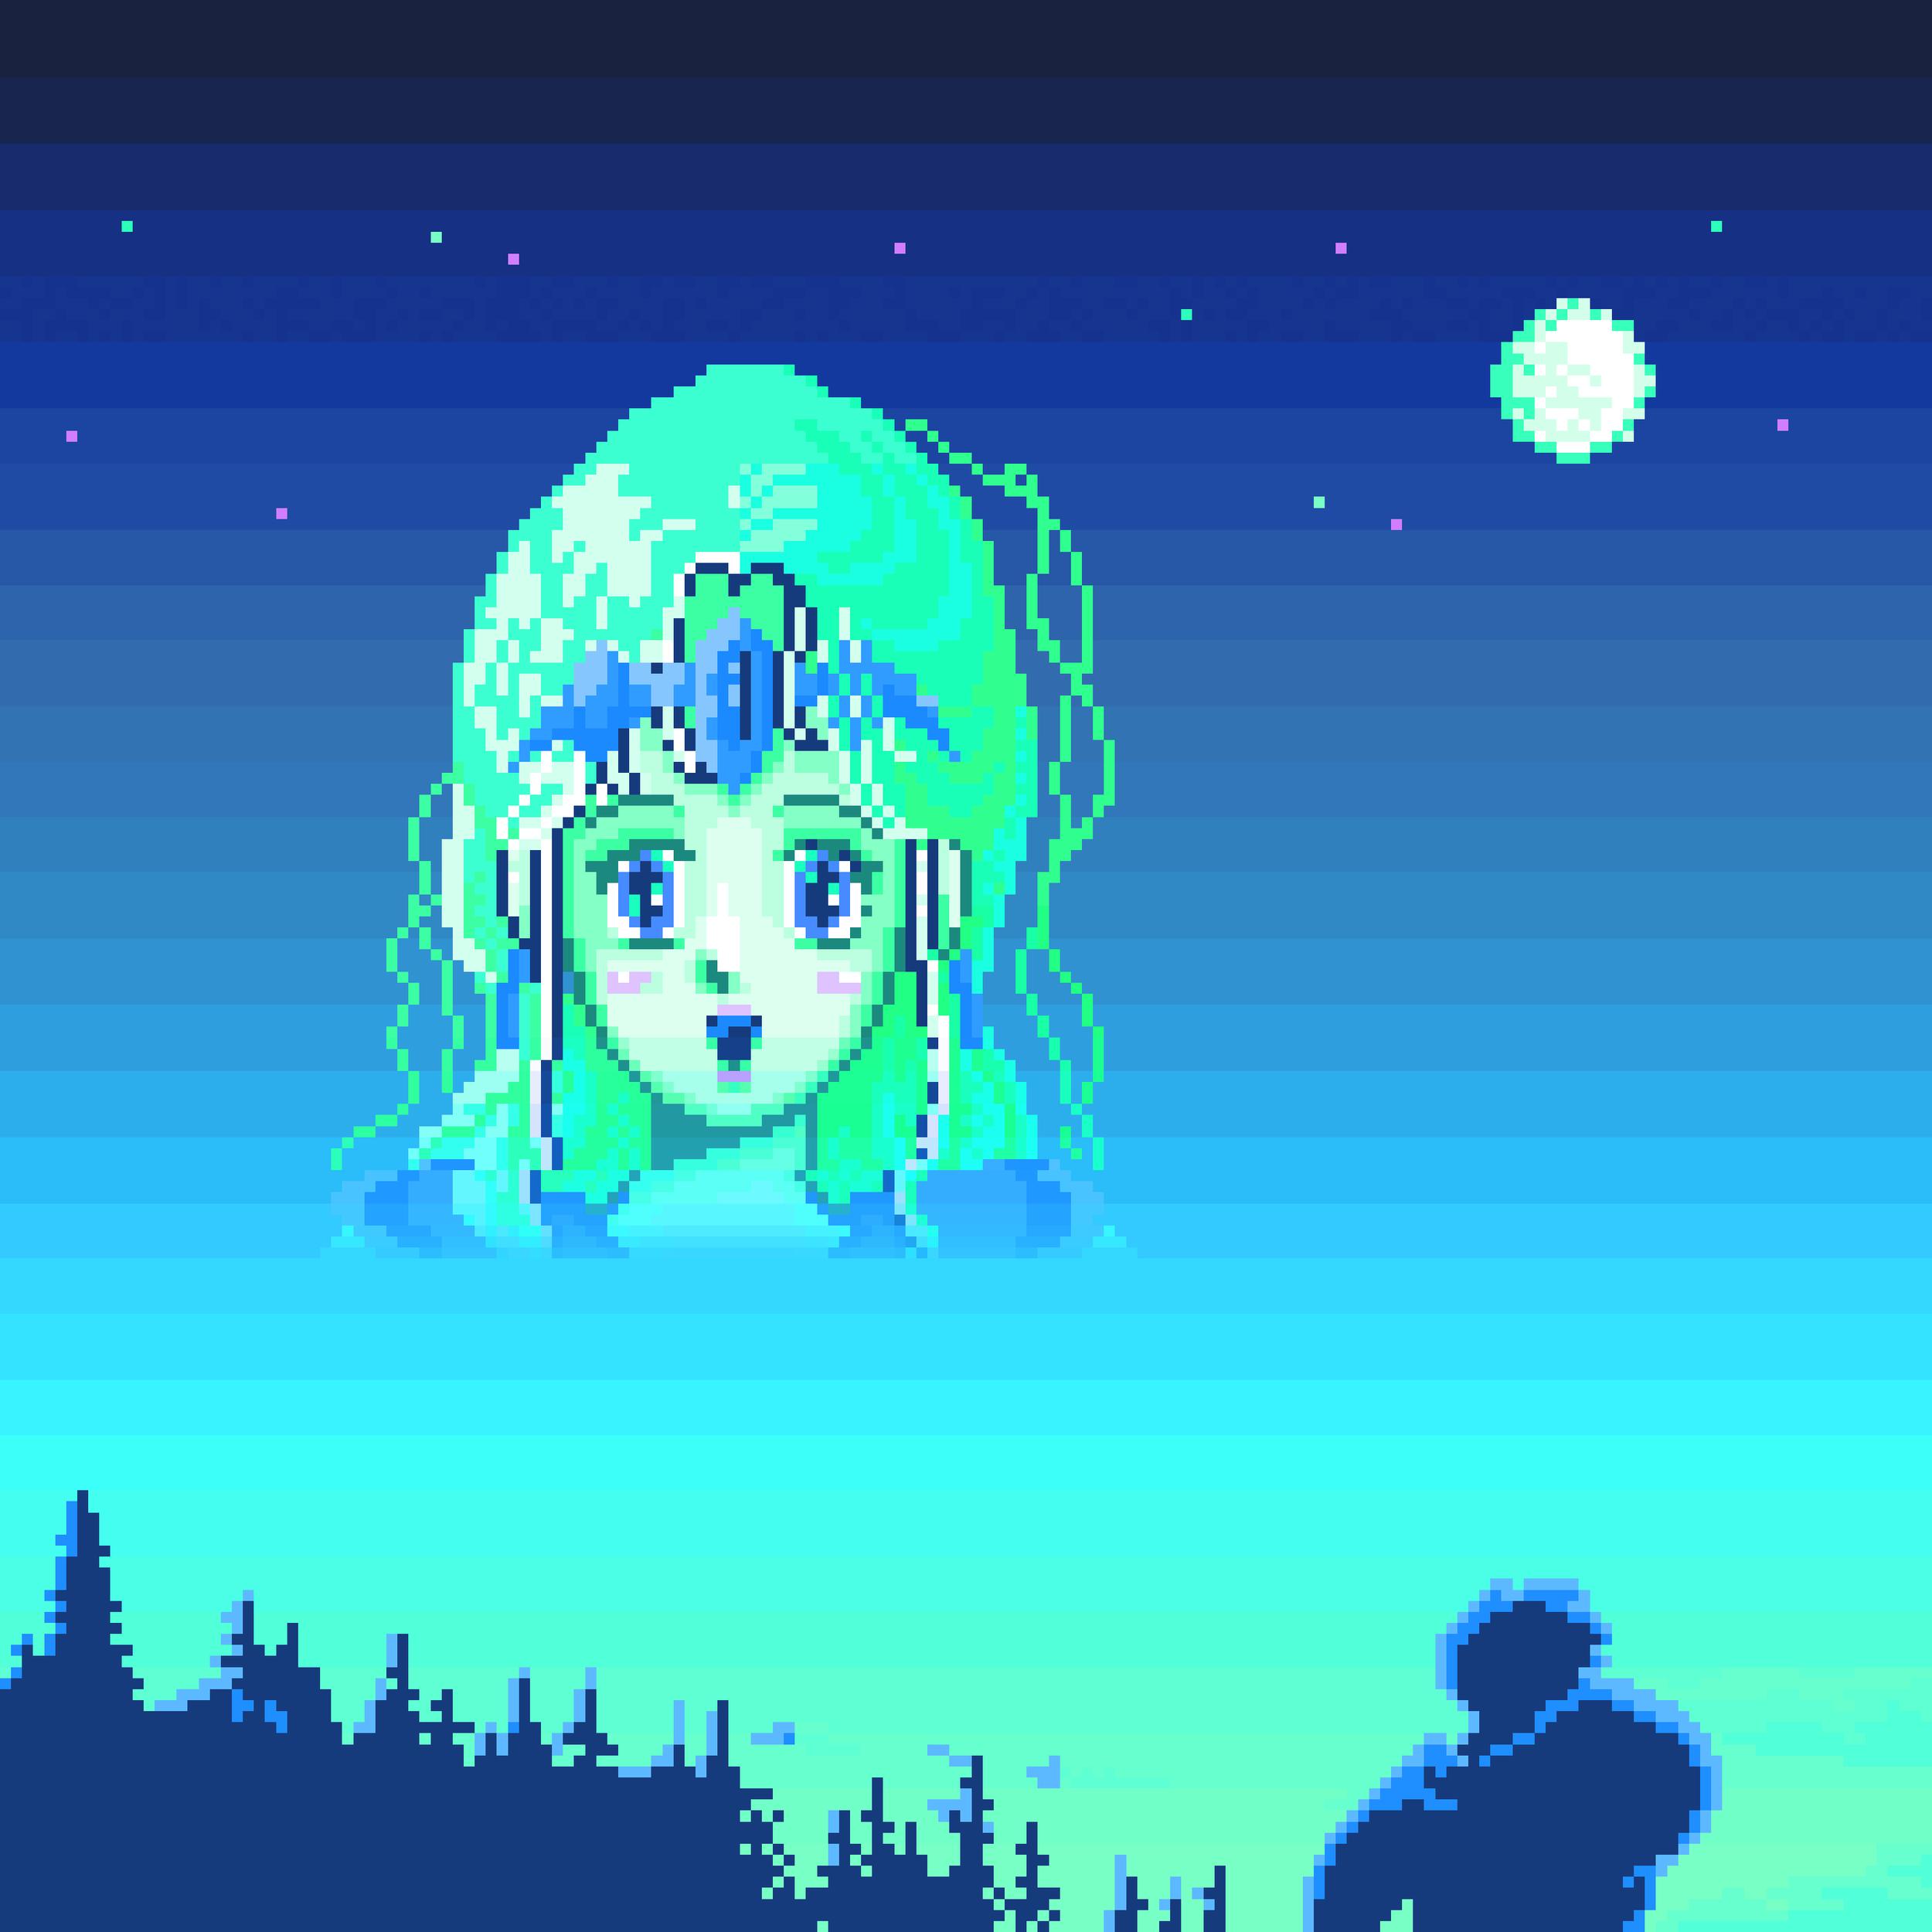 lagoon-pixel-art.png